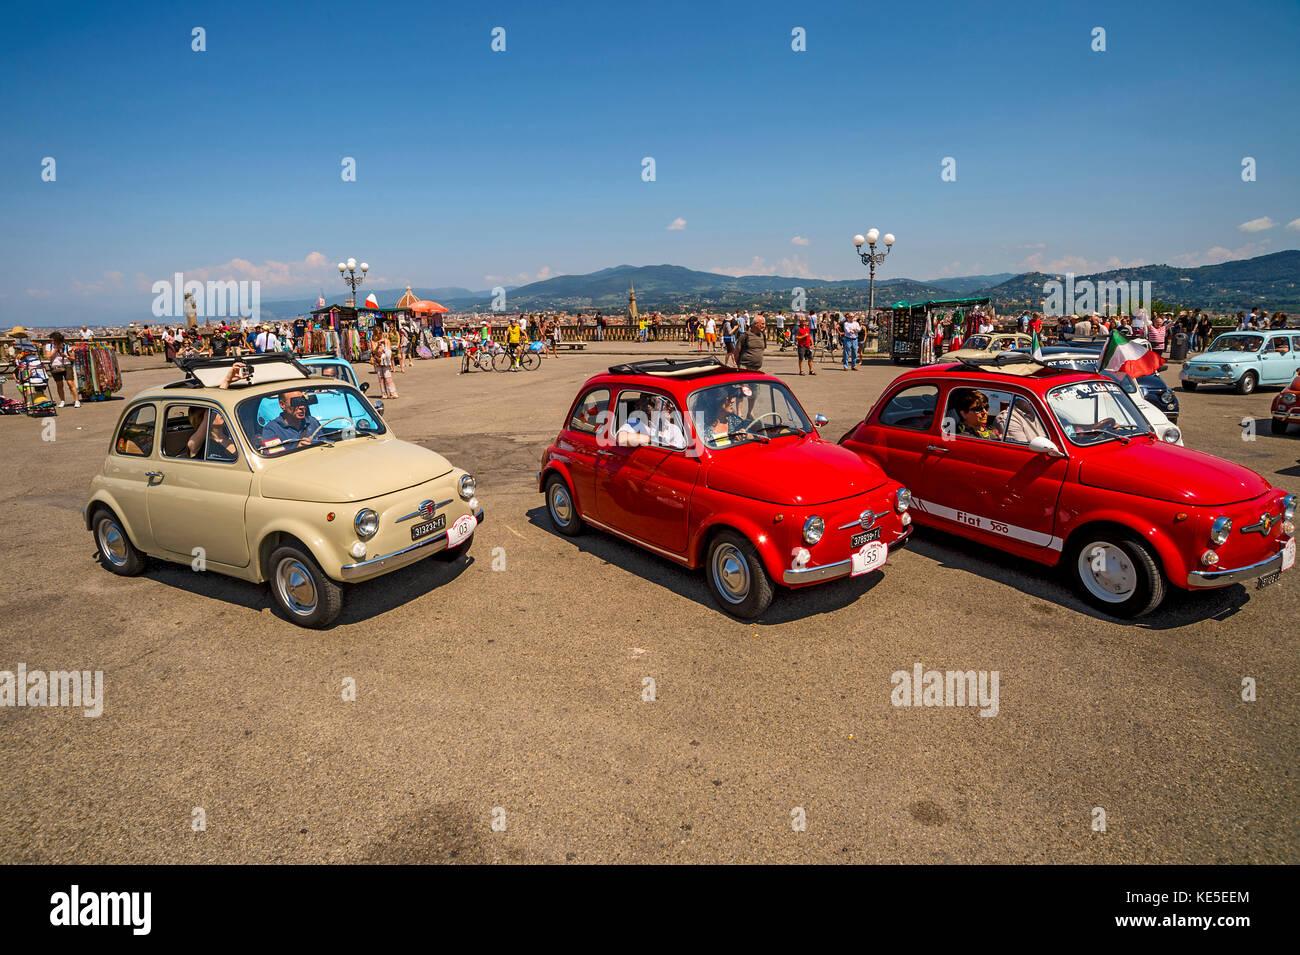 europa l 39 italia toscana l 39 italia fiat 500 vecchia auto. Black Bedroom Furniture Sets. Home Design Ideas